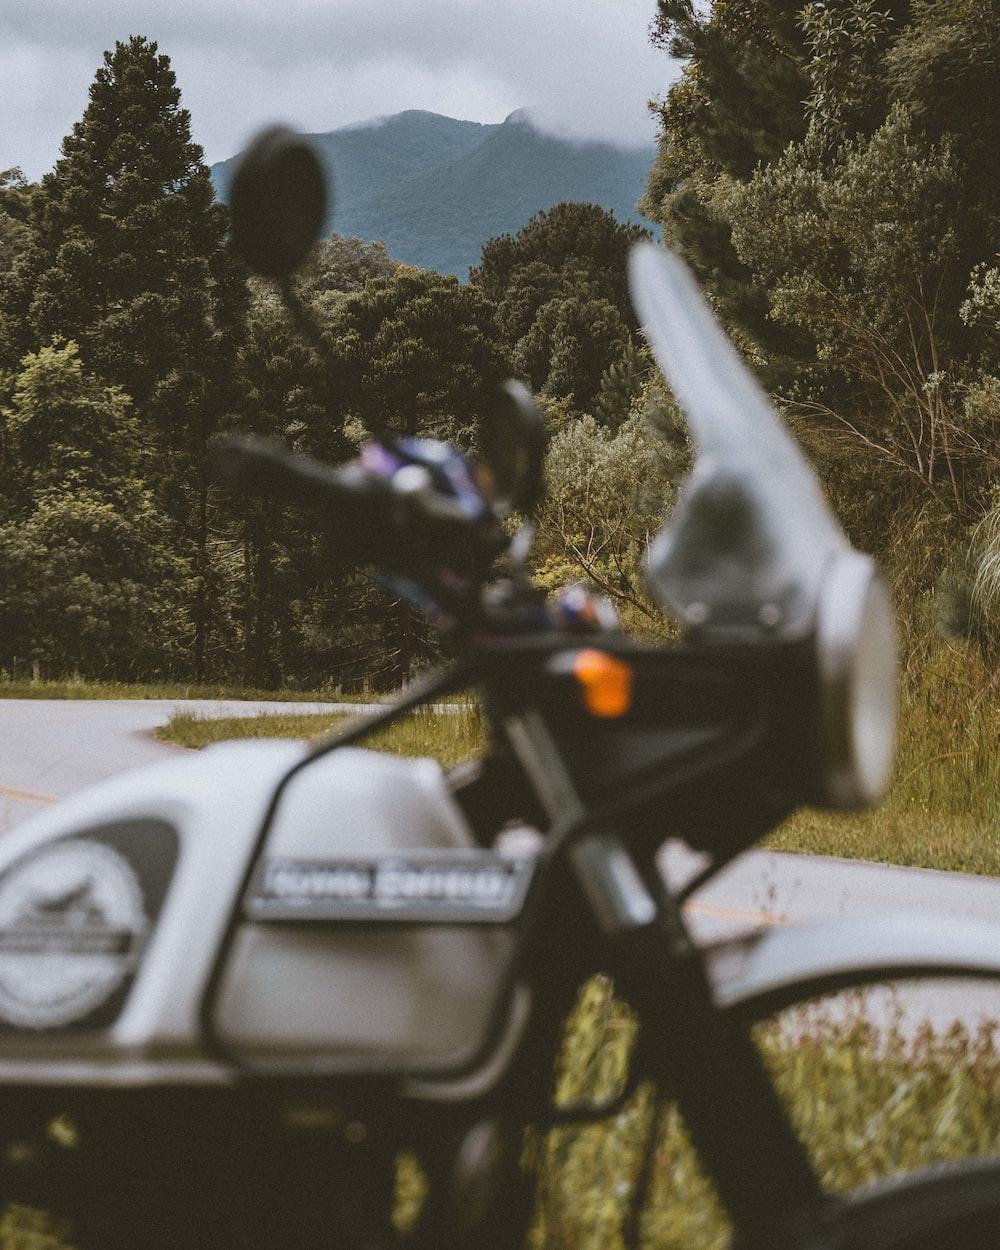 white honda motorcycle parked on gray asphalt road during daytime